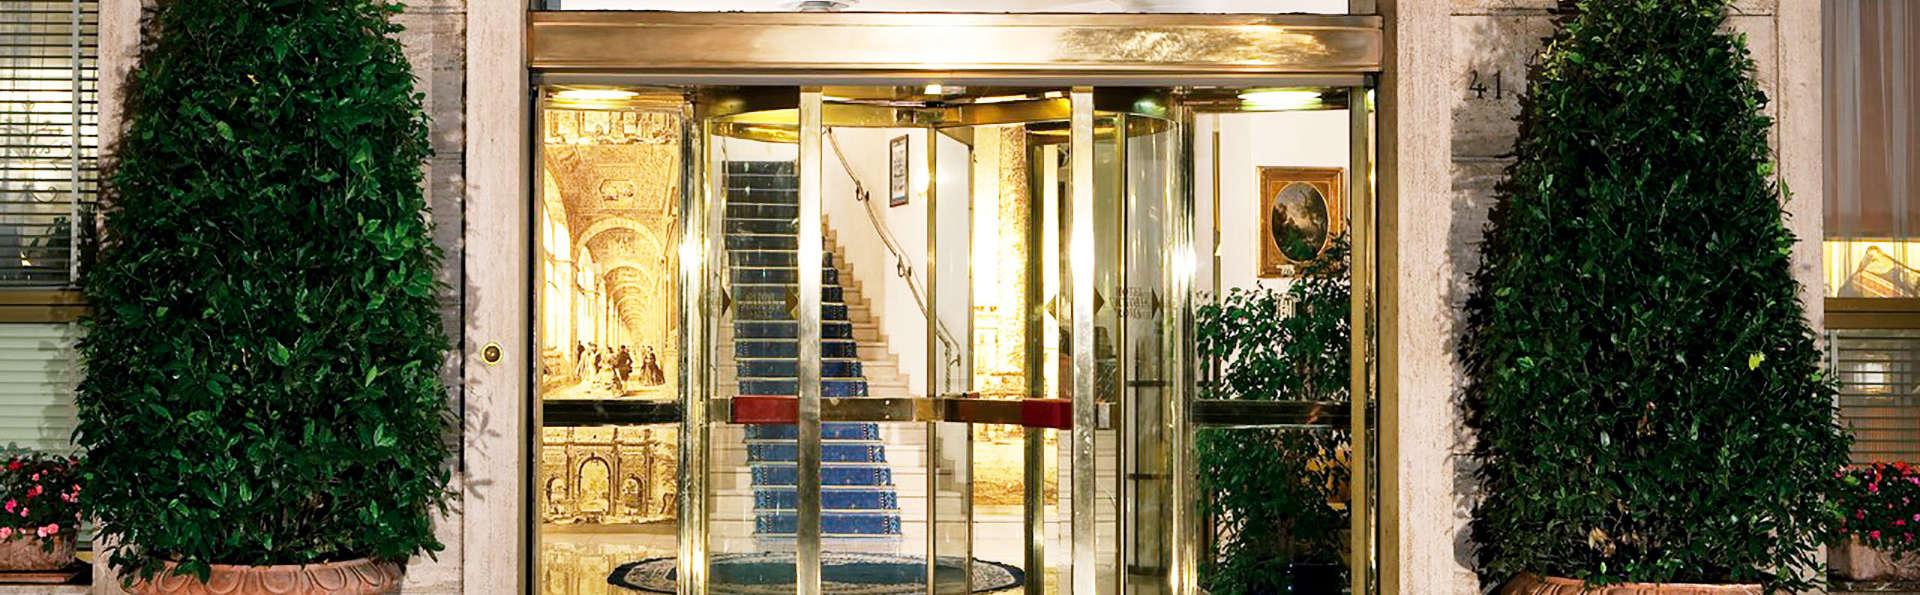 Hotel Victoria Roma - EDIT_entry.jpg